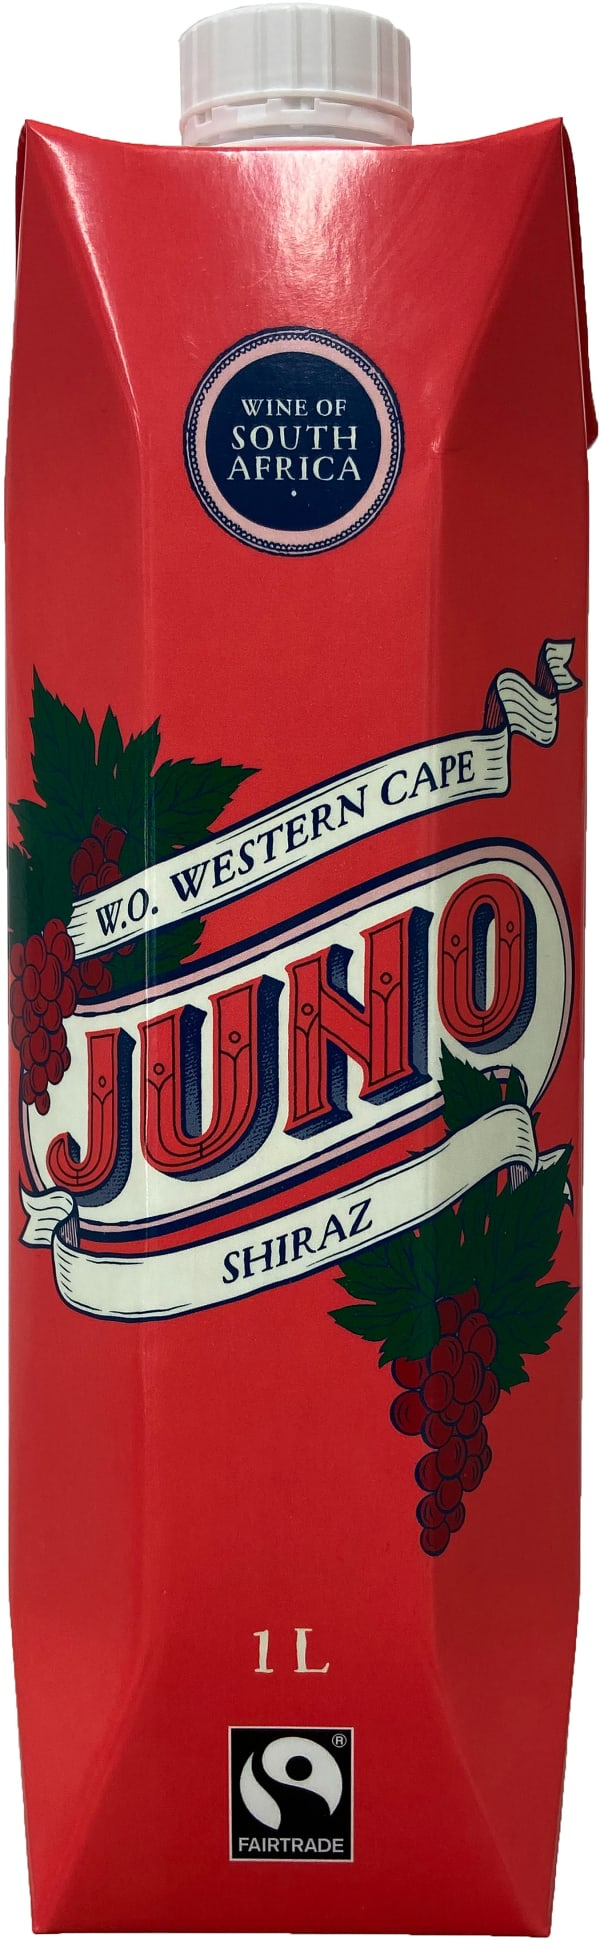 Juno Shiraz 2019 kartongförpackning